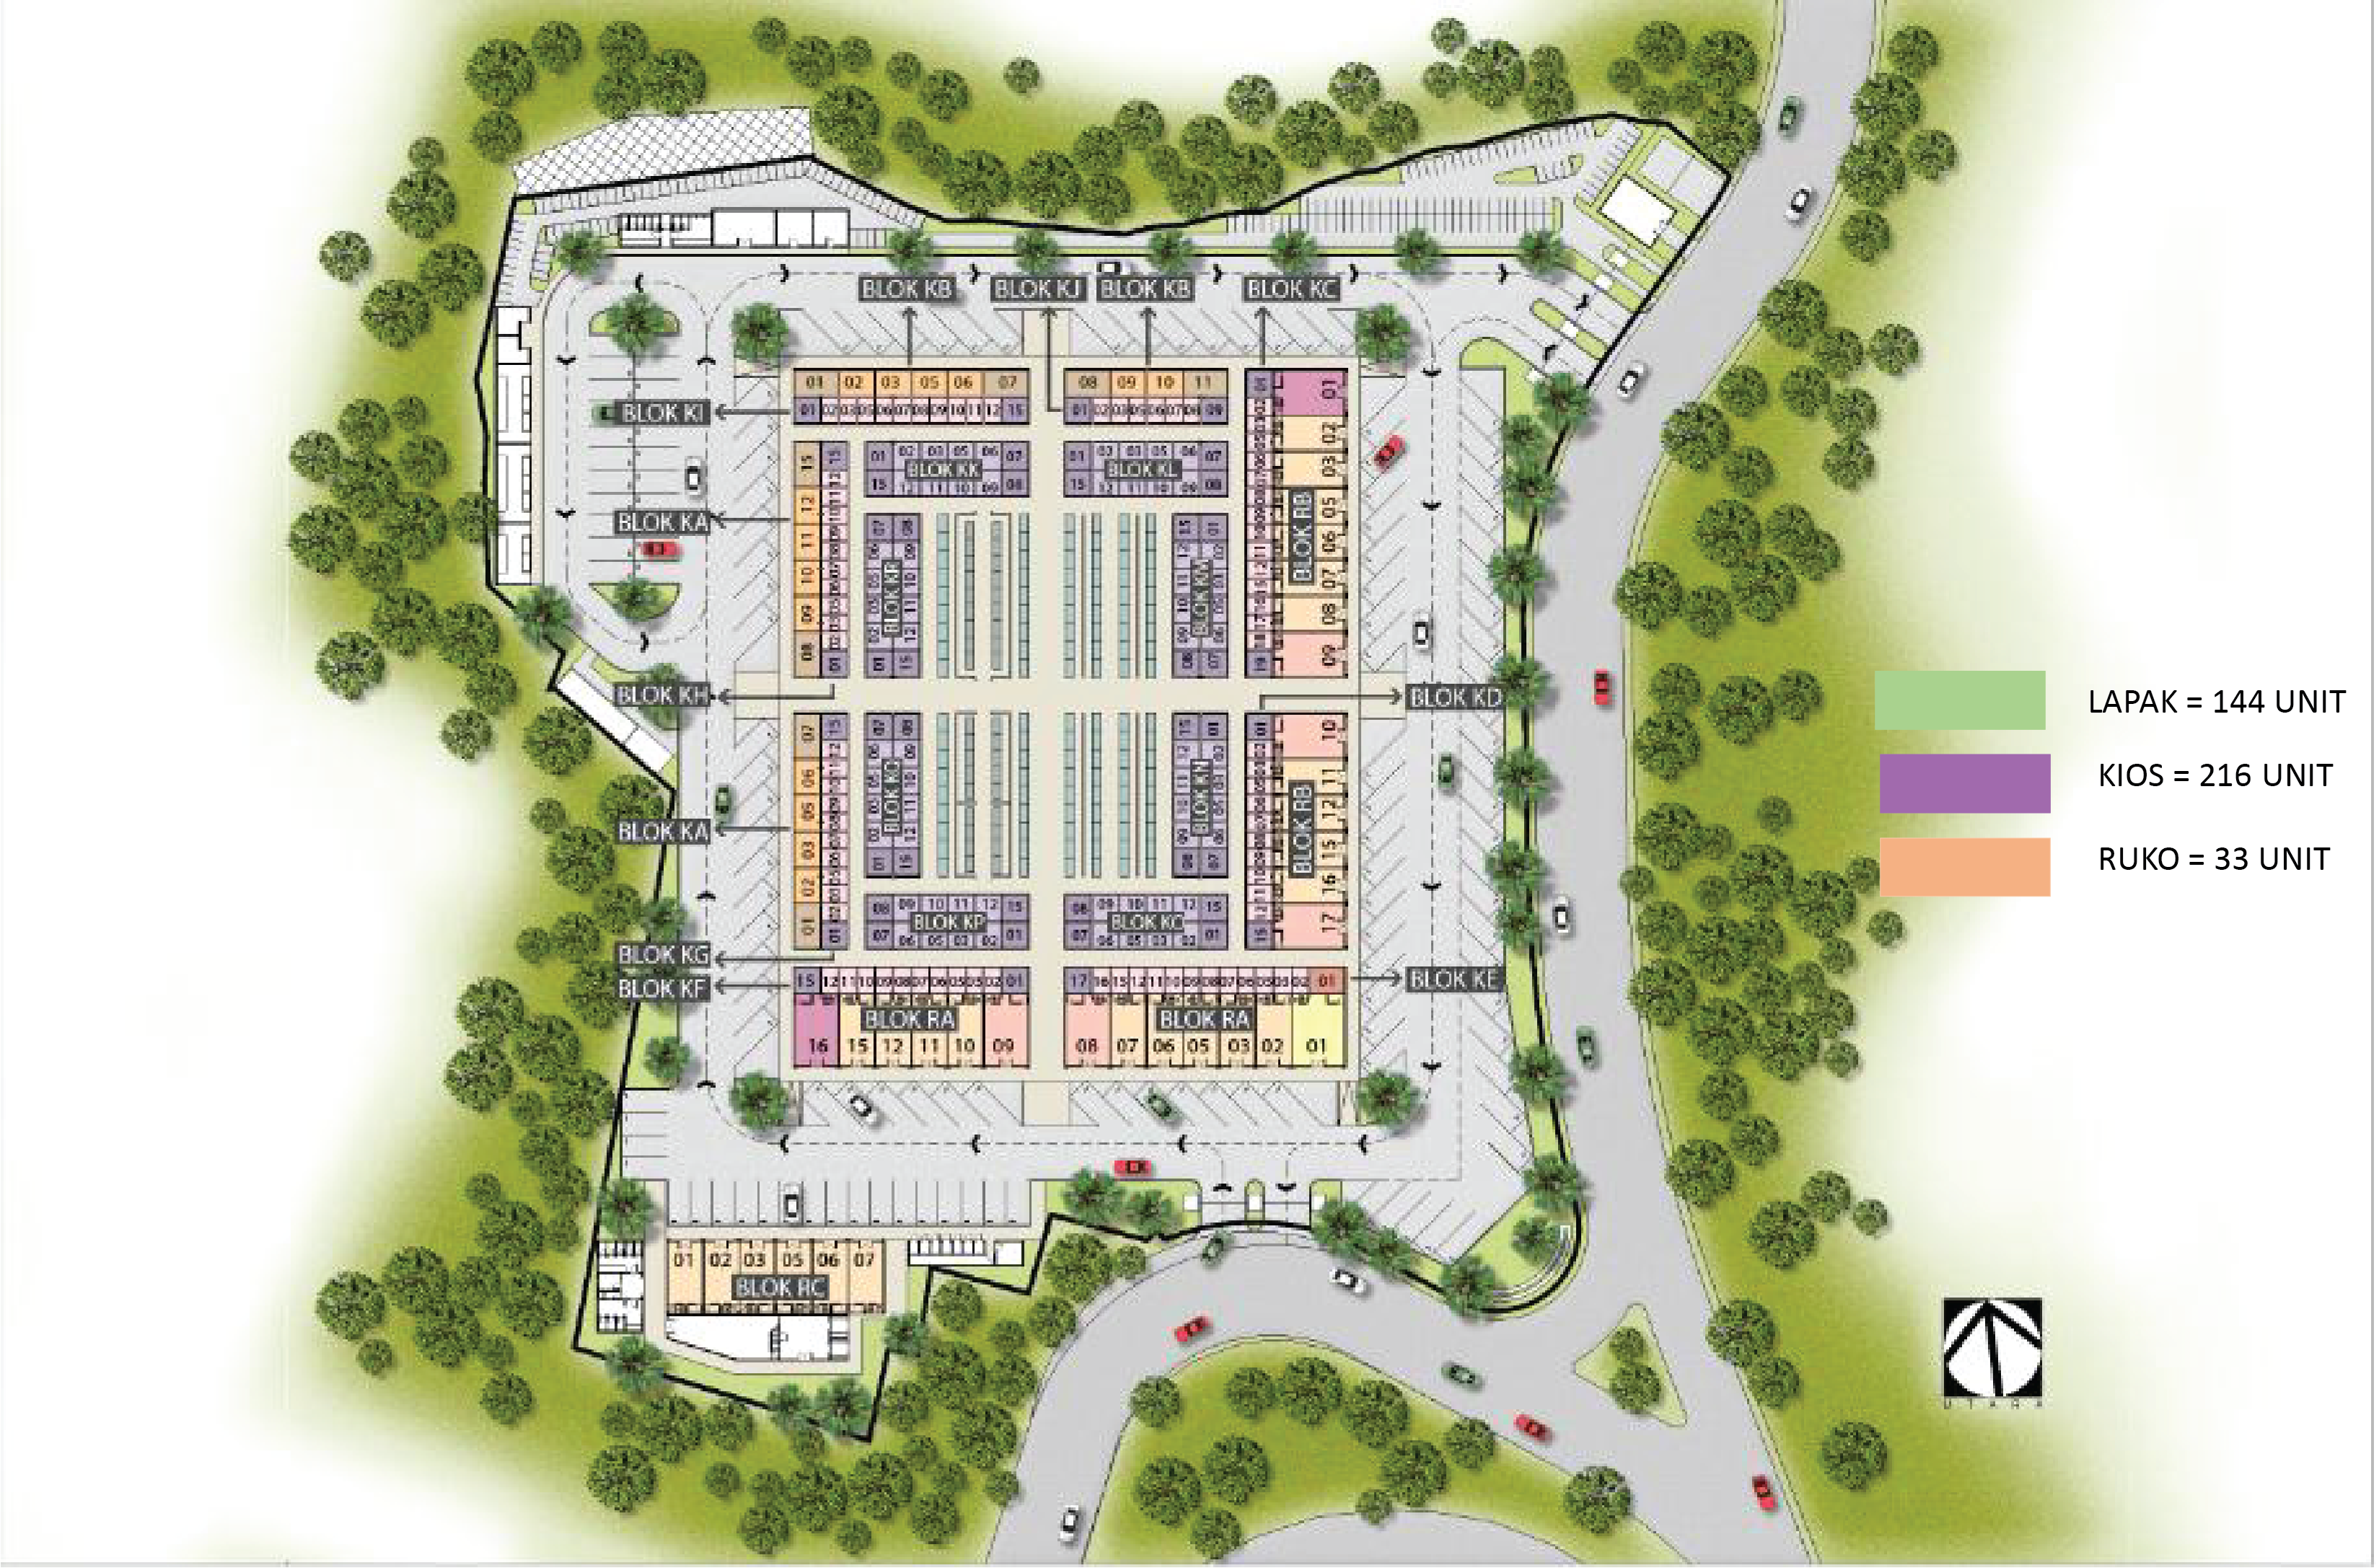 Site plan pasar modern graha raya 99 co indonesia